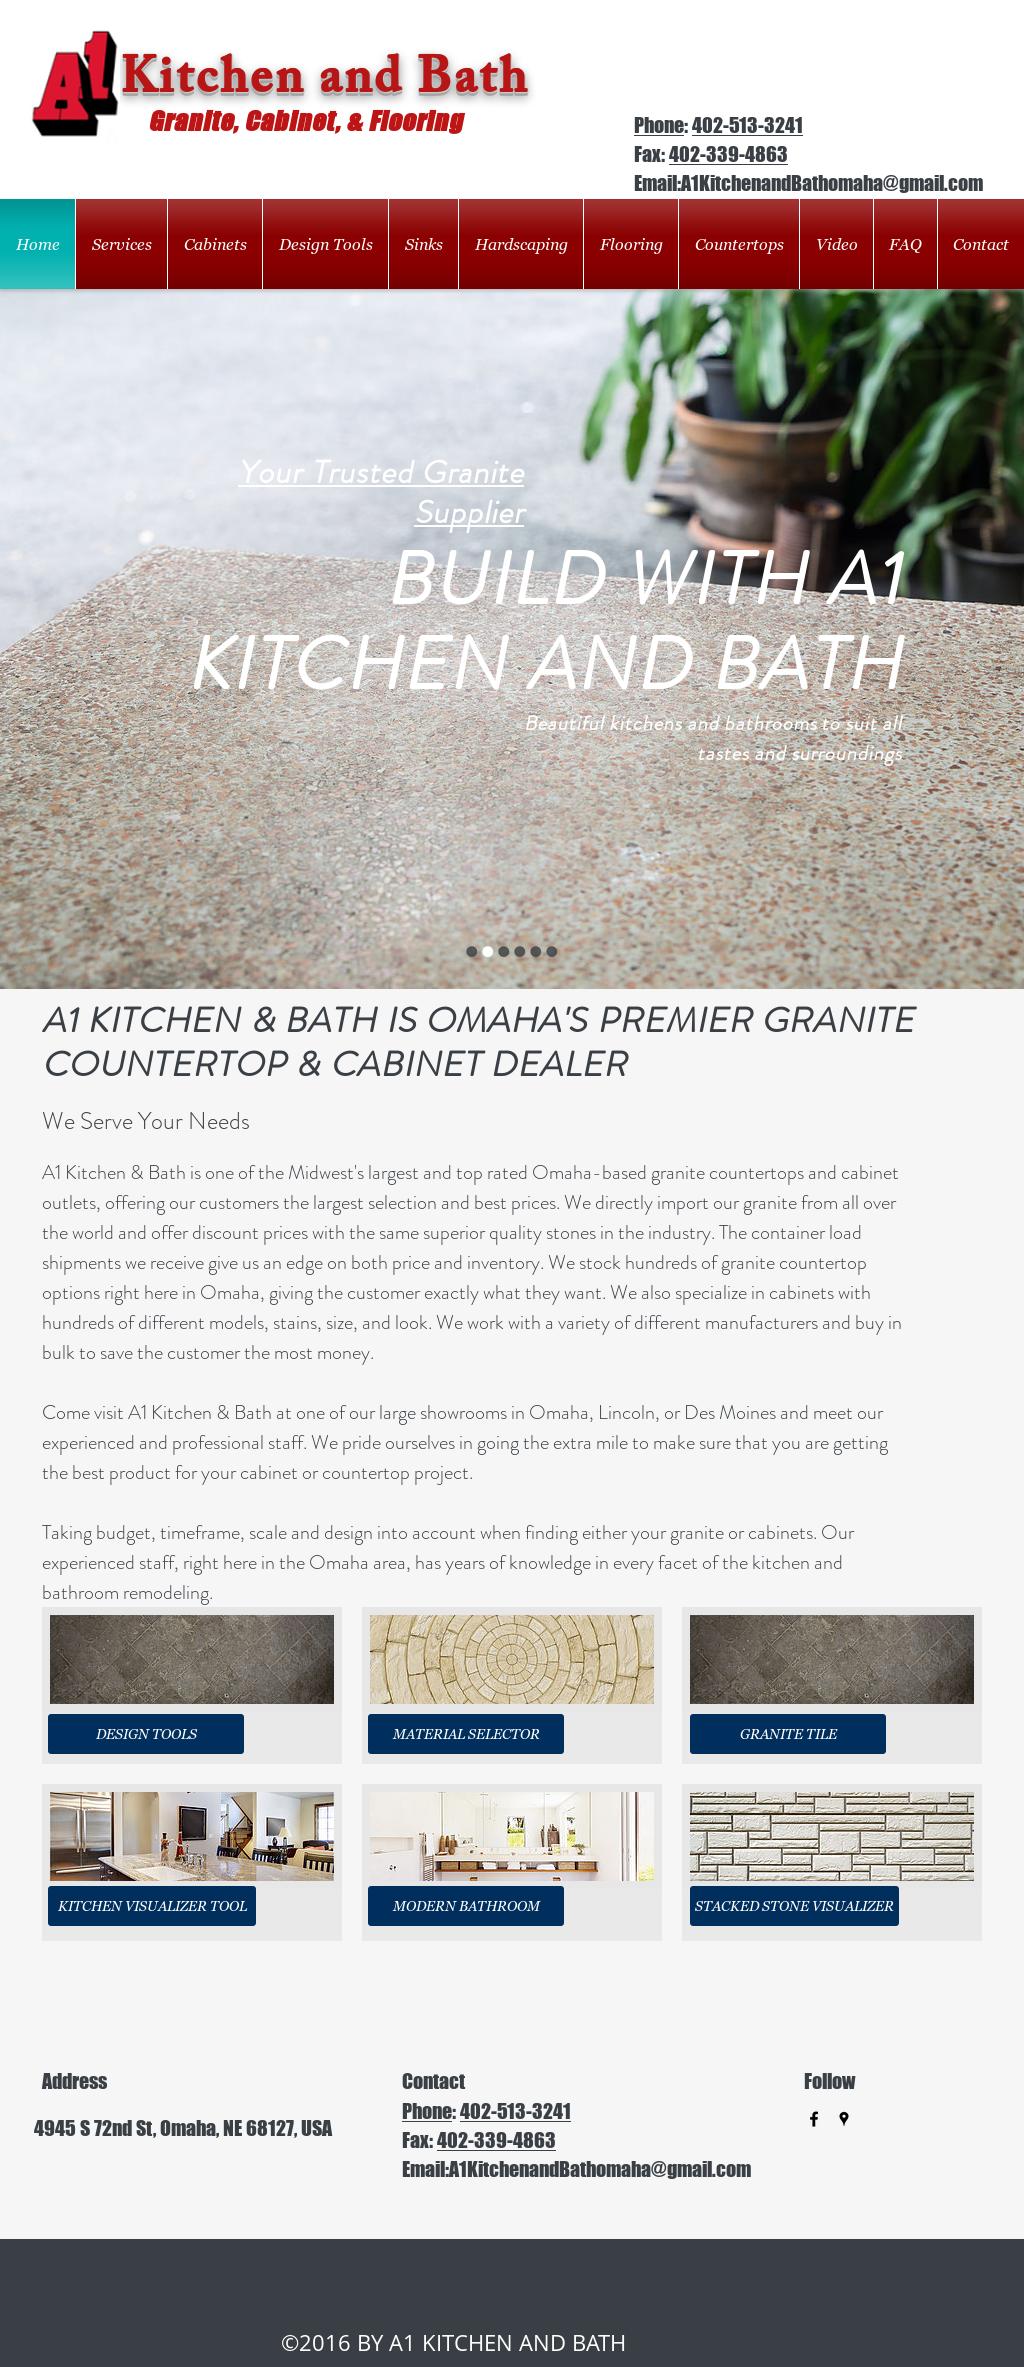 Etonnant A1 Kitchen U0026 Bath Competitors, Revenue And Employees   Owler Company Profile